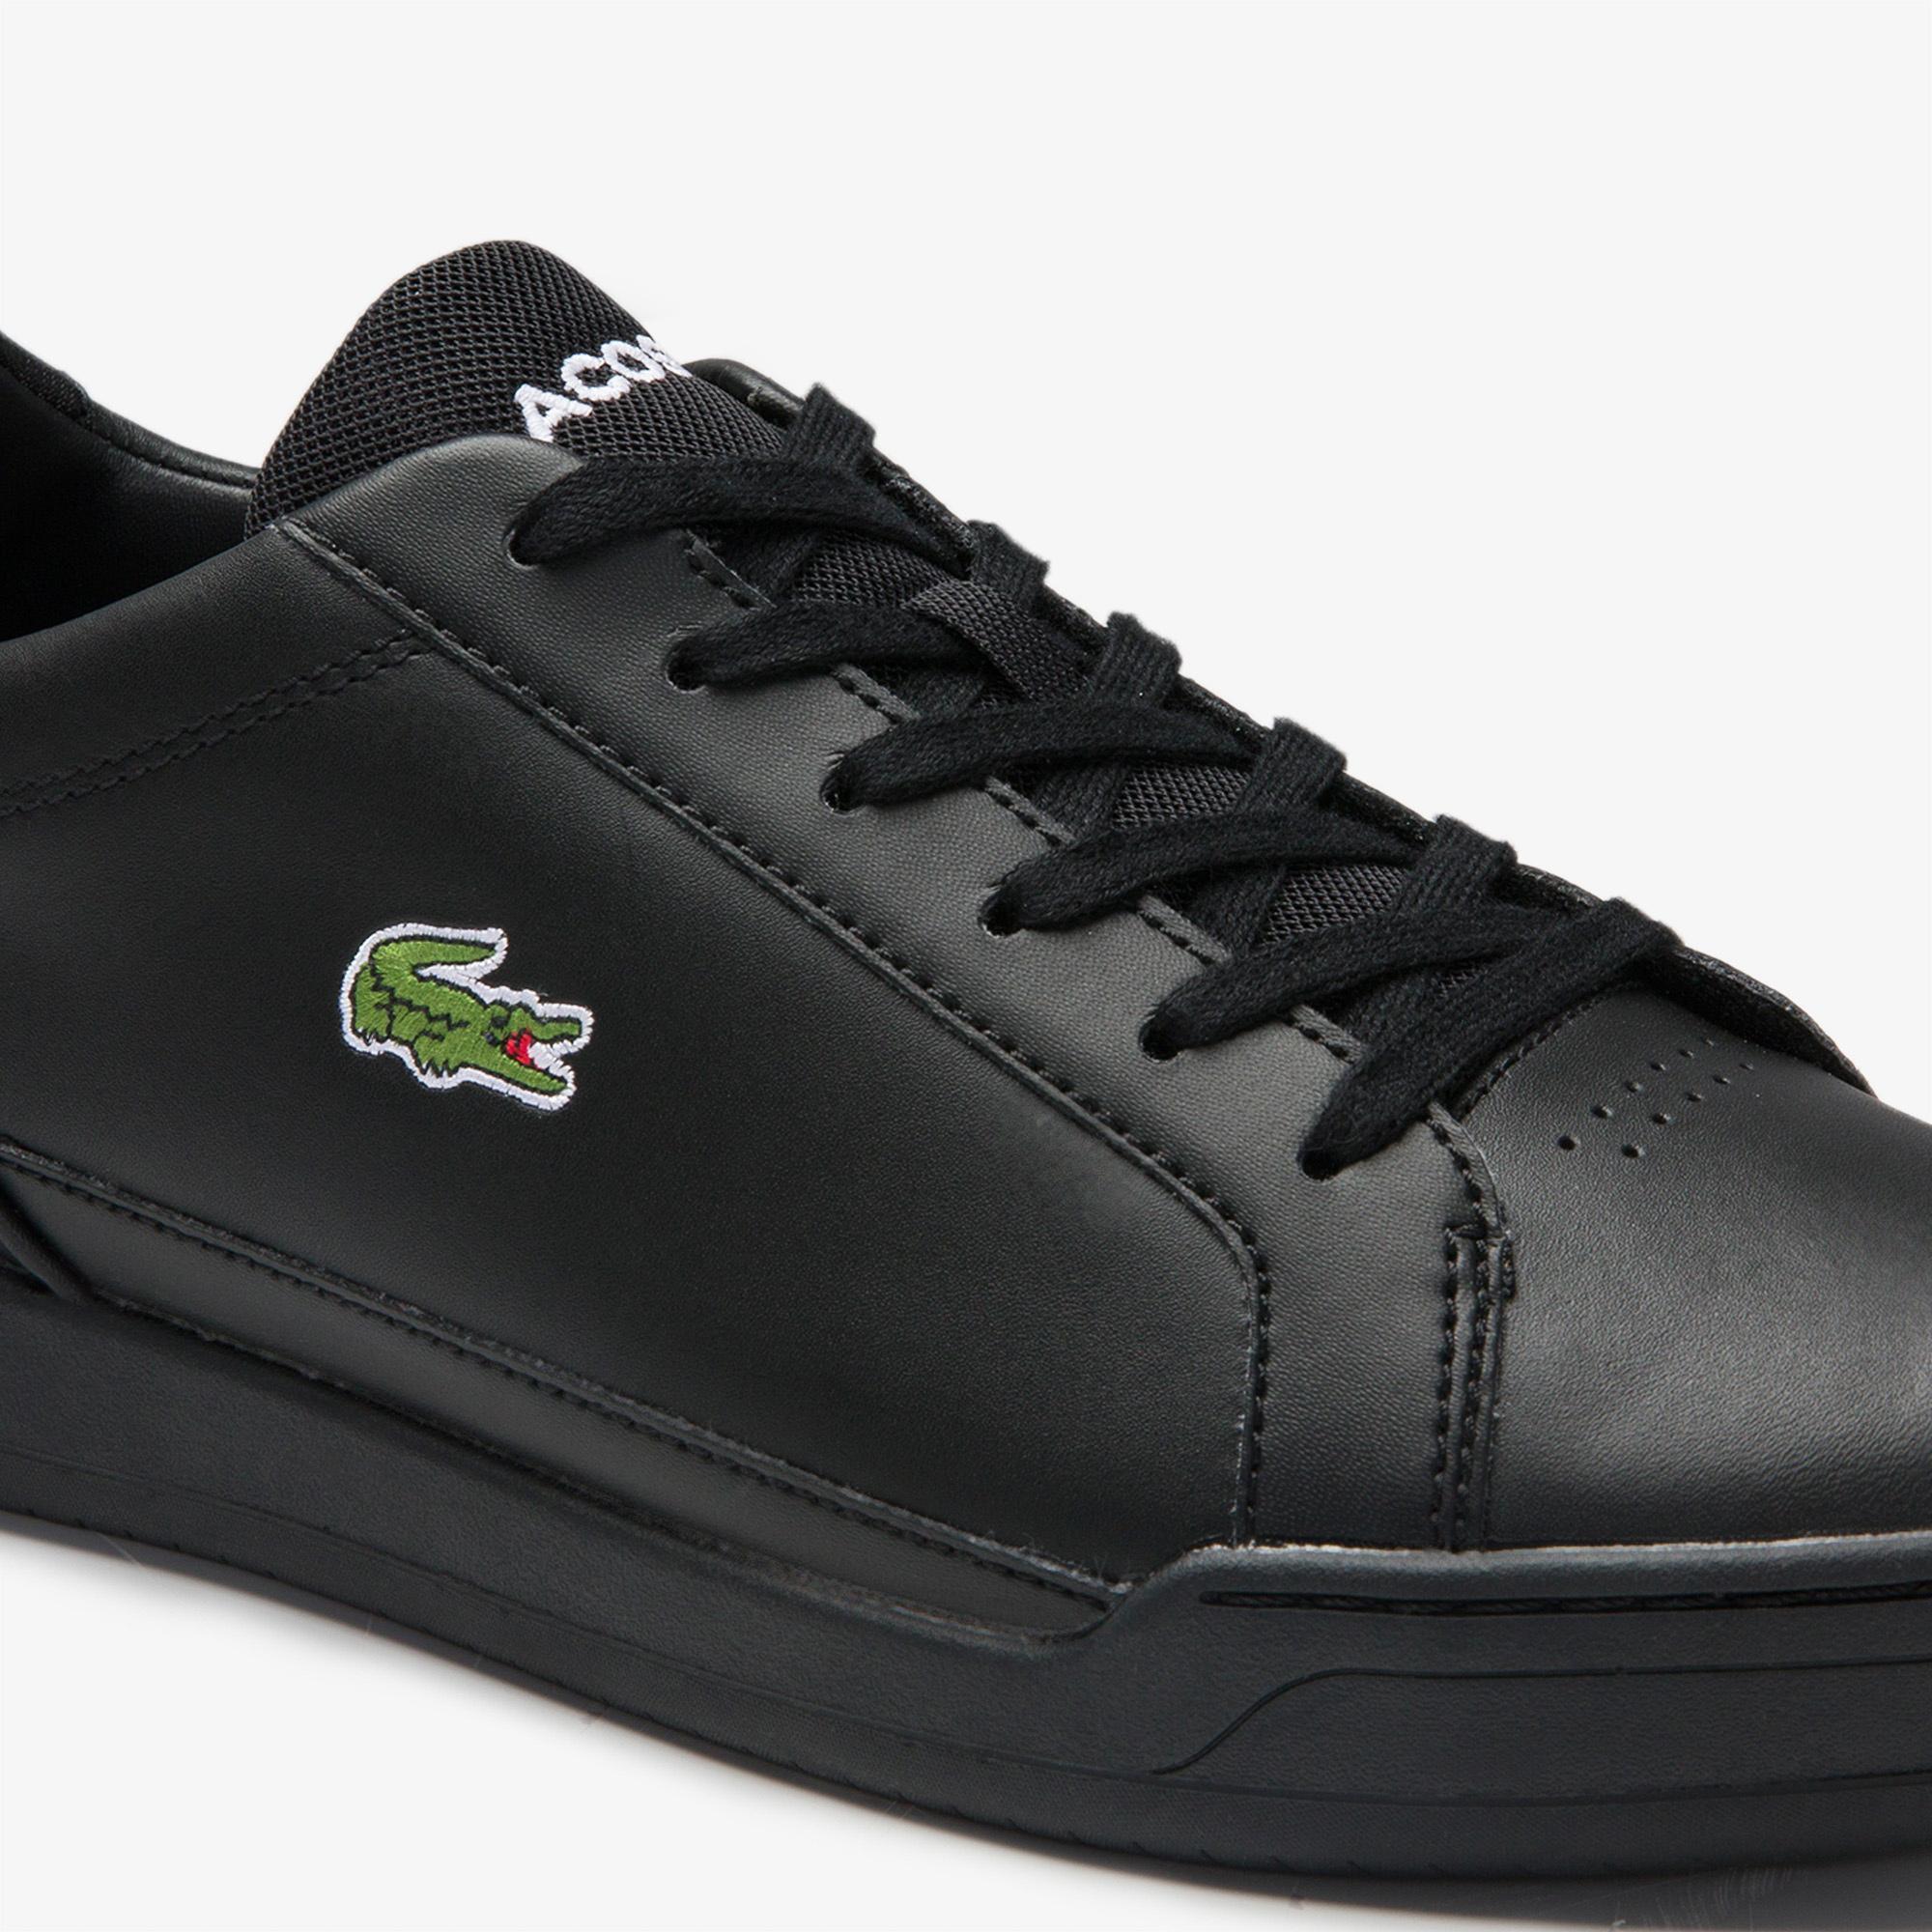 Lacoste Challenge 0120 2 Sma Erkek Deri Siyah Sneaker